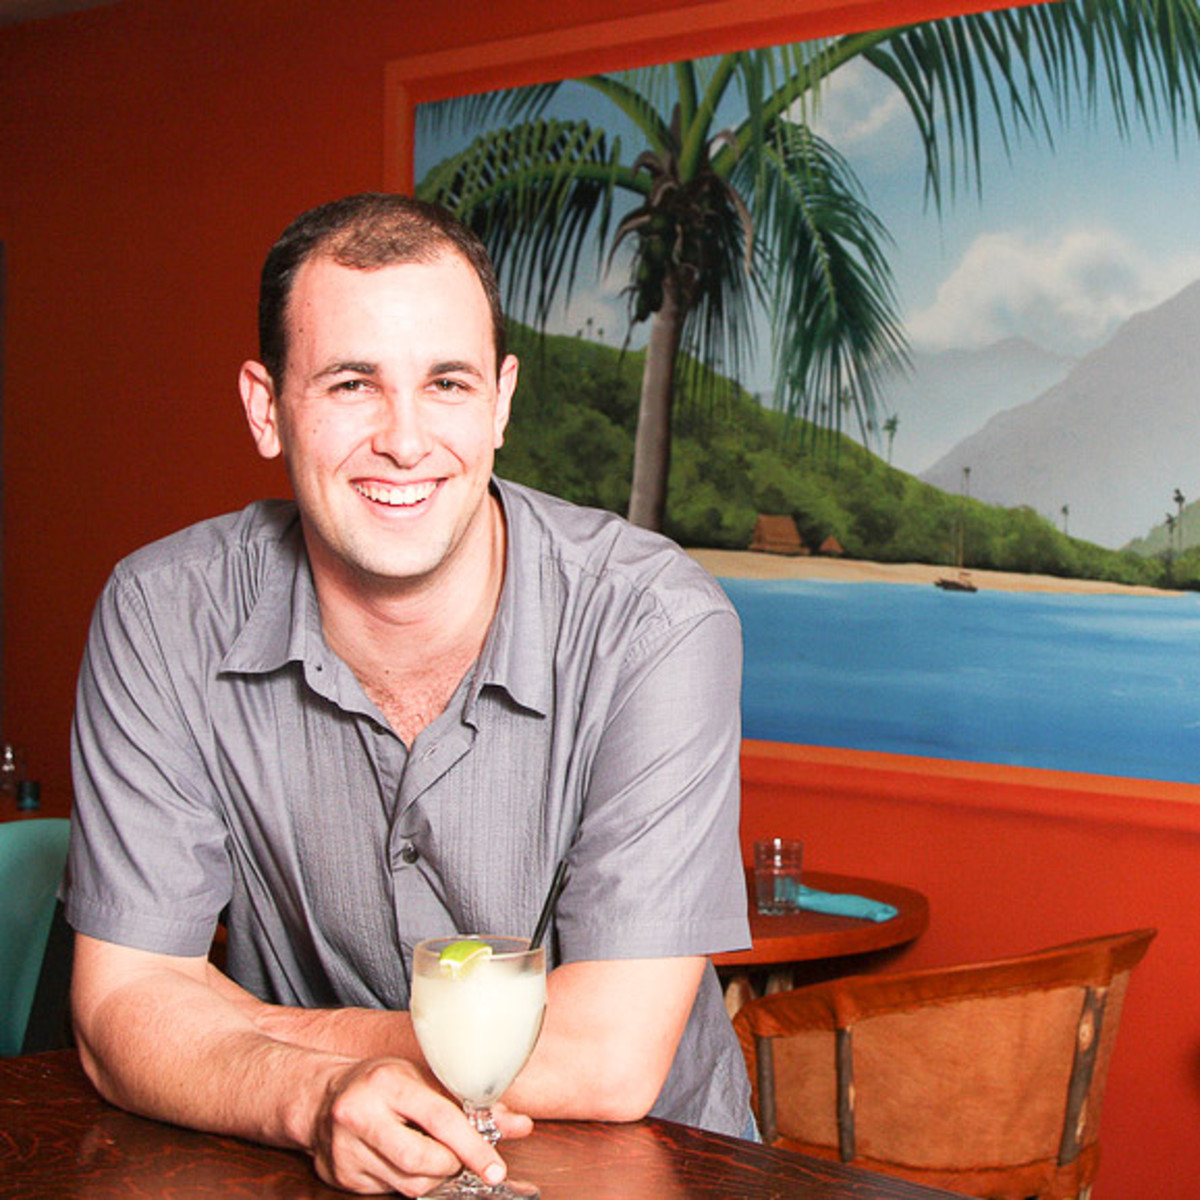 Places_Food_Yelapa Playa Mexicana Restaurant_L.J. Wiley_chef